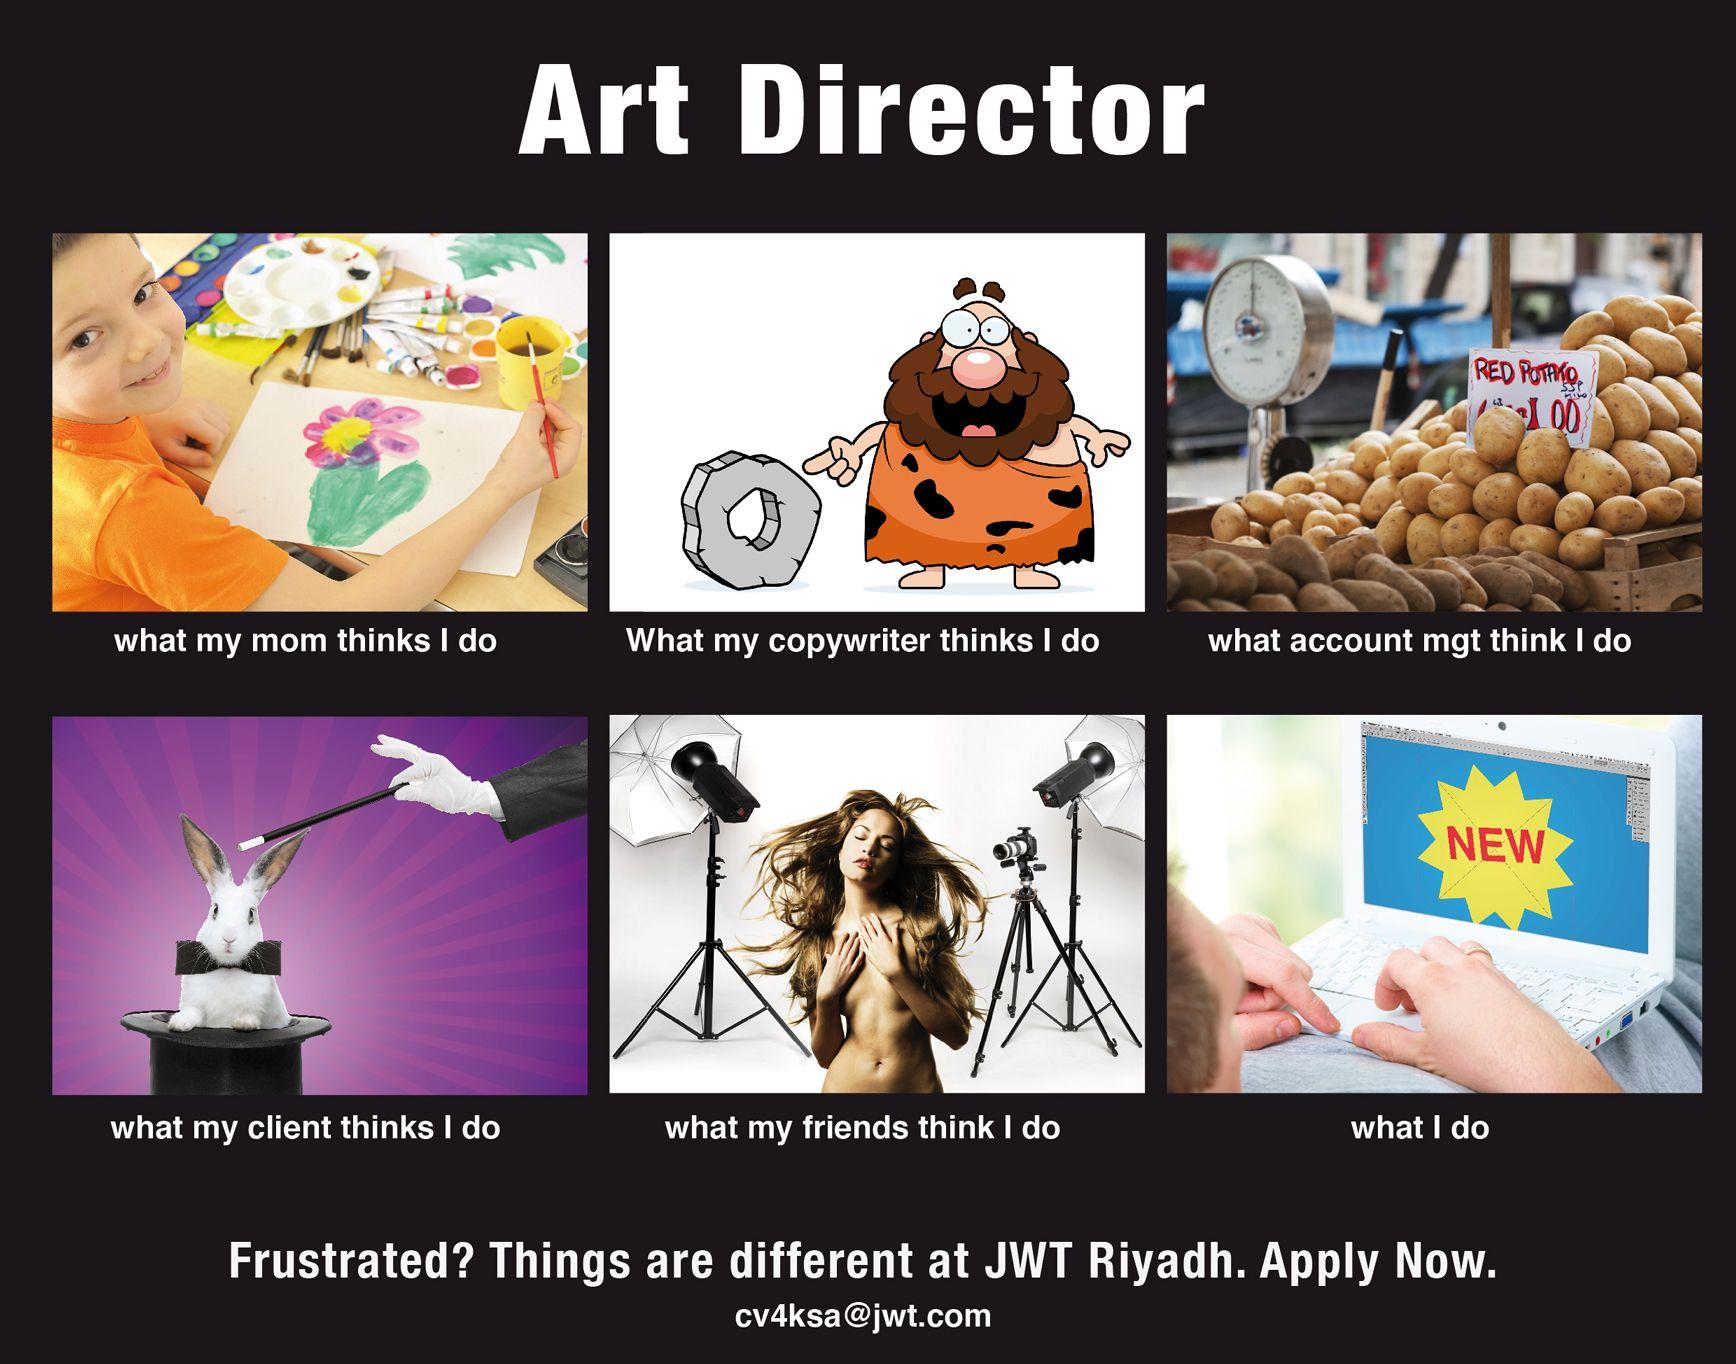 Jwt Riyadh Recruitment Ad For An Art Director  Digital  Viral